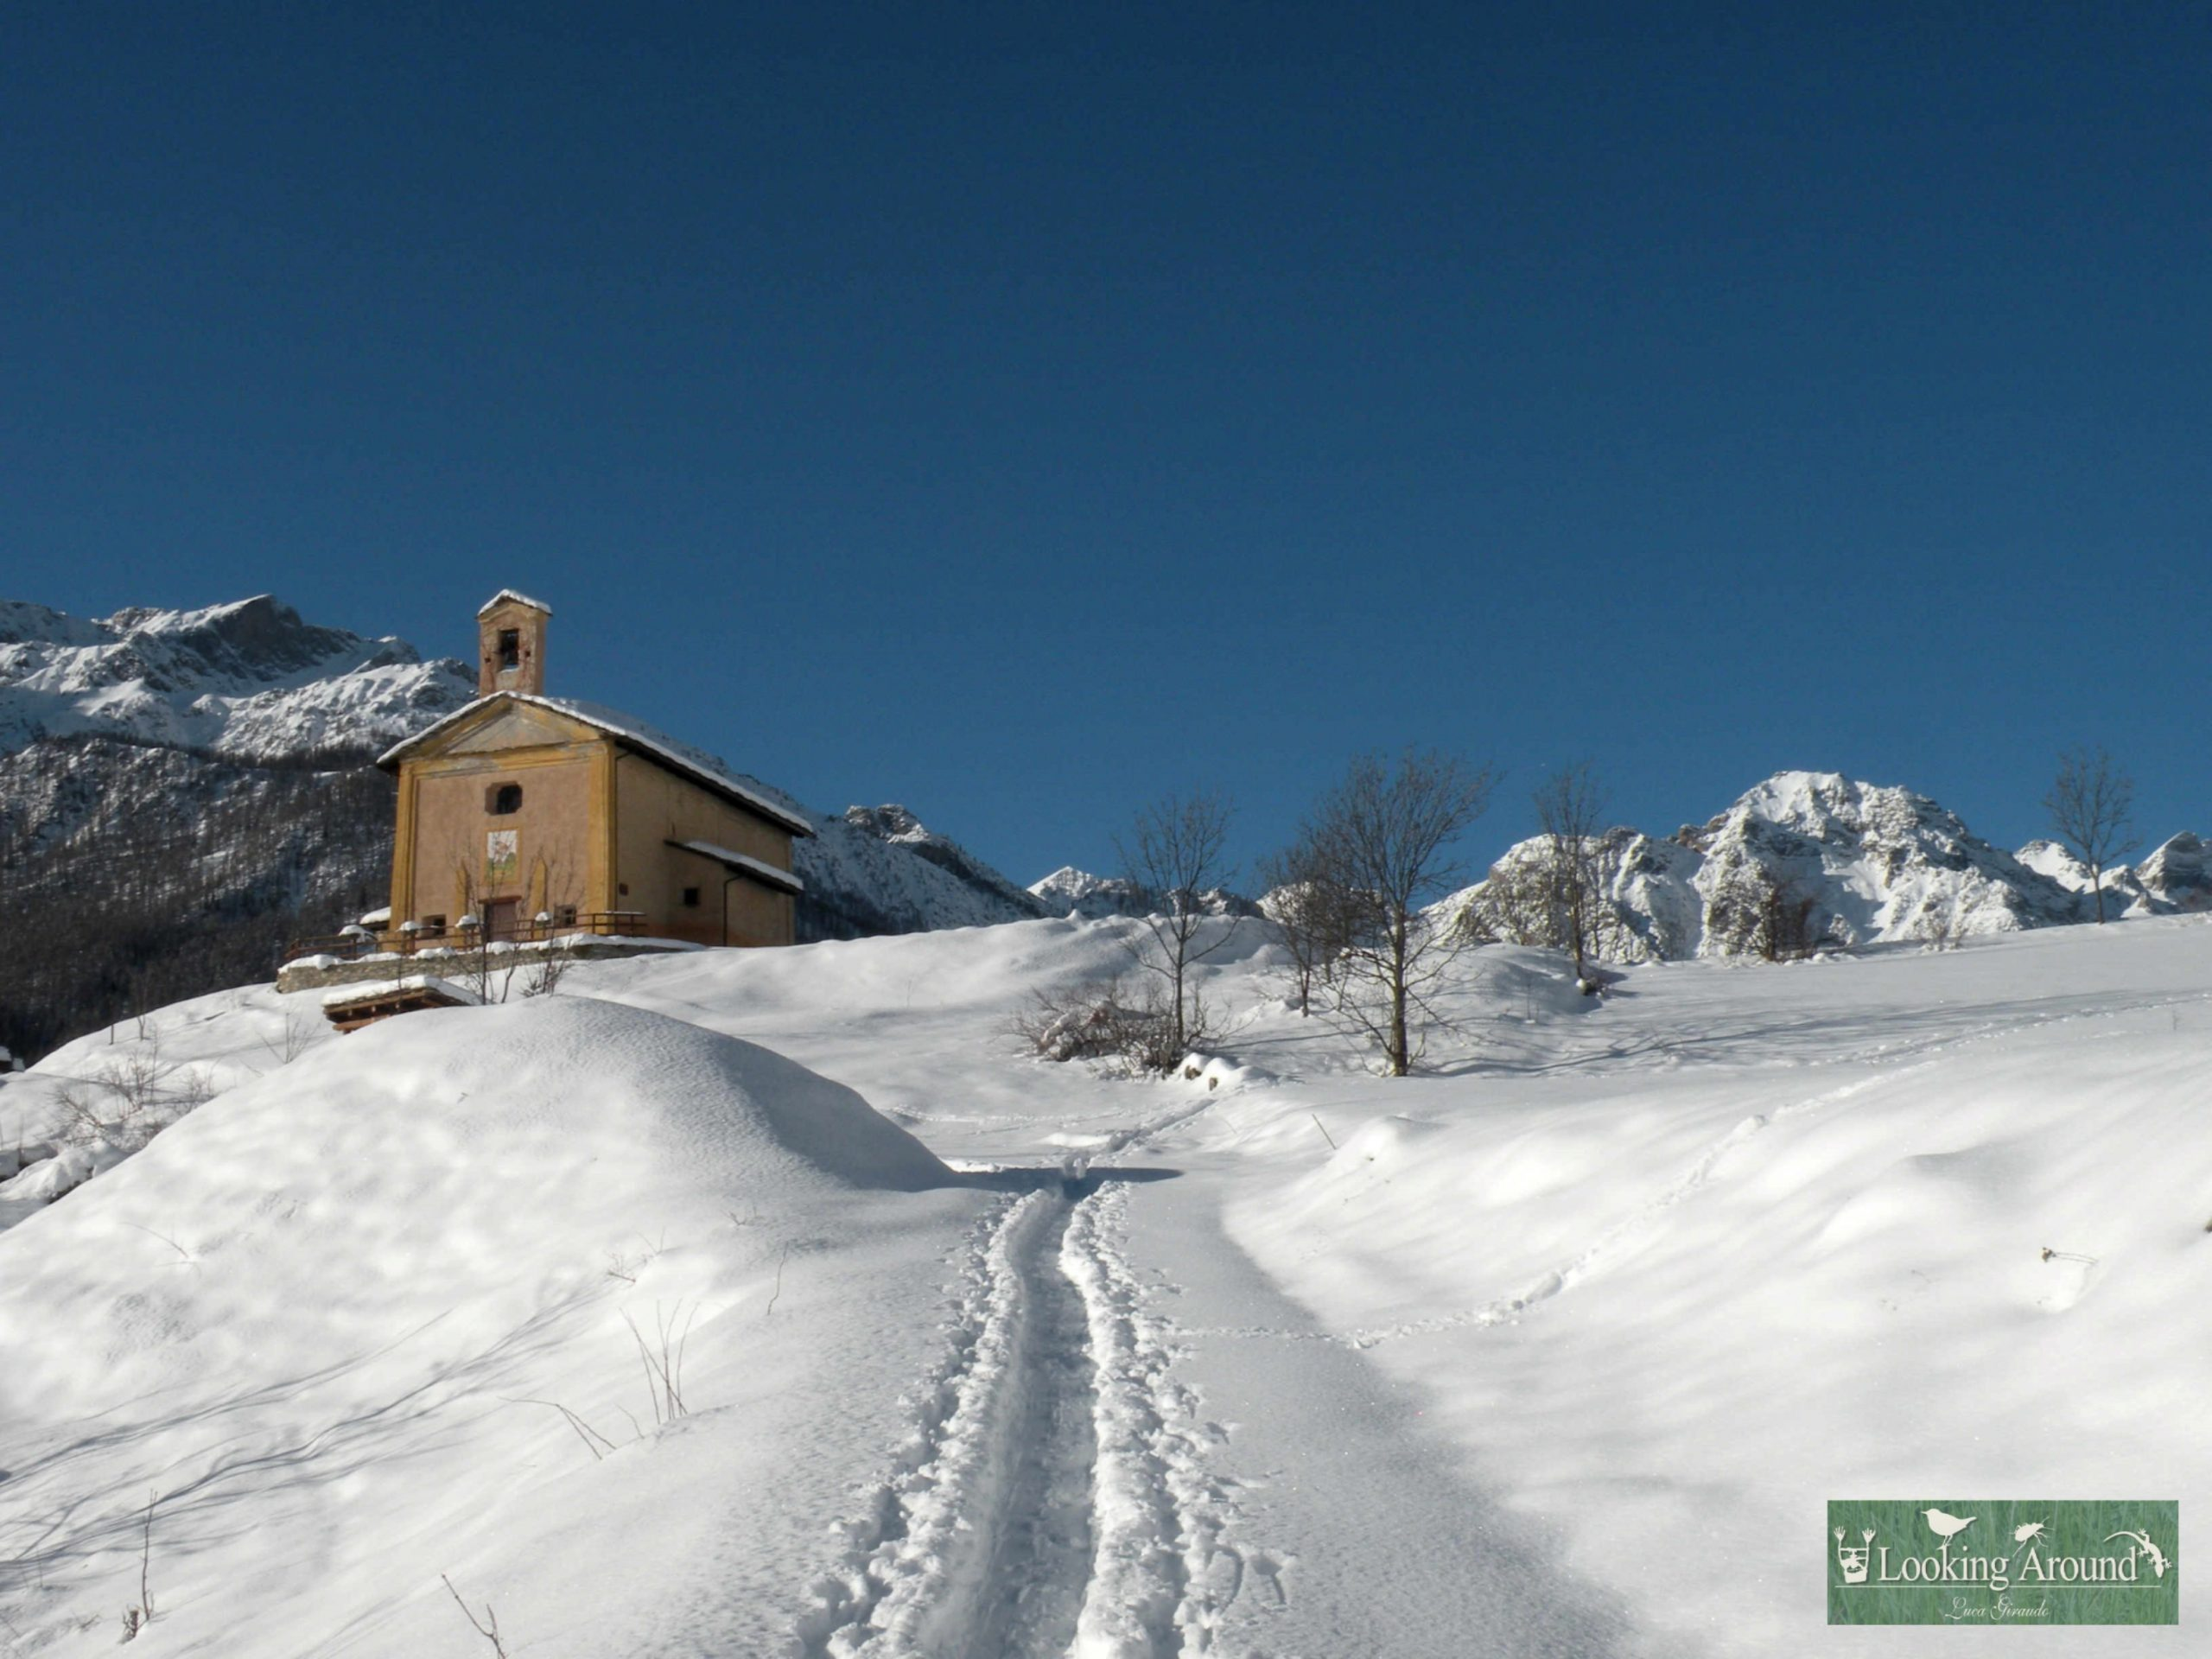 Valle Maira_Inverno_foto Luca Giraudo (18)w (002)